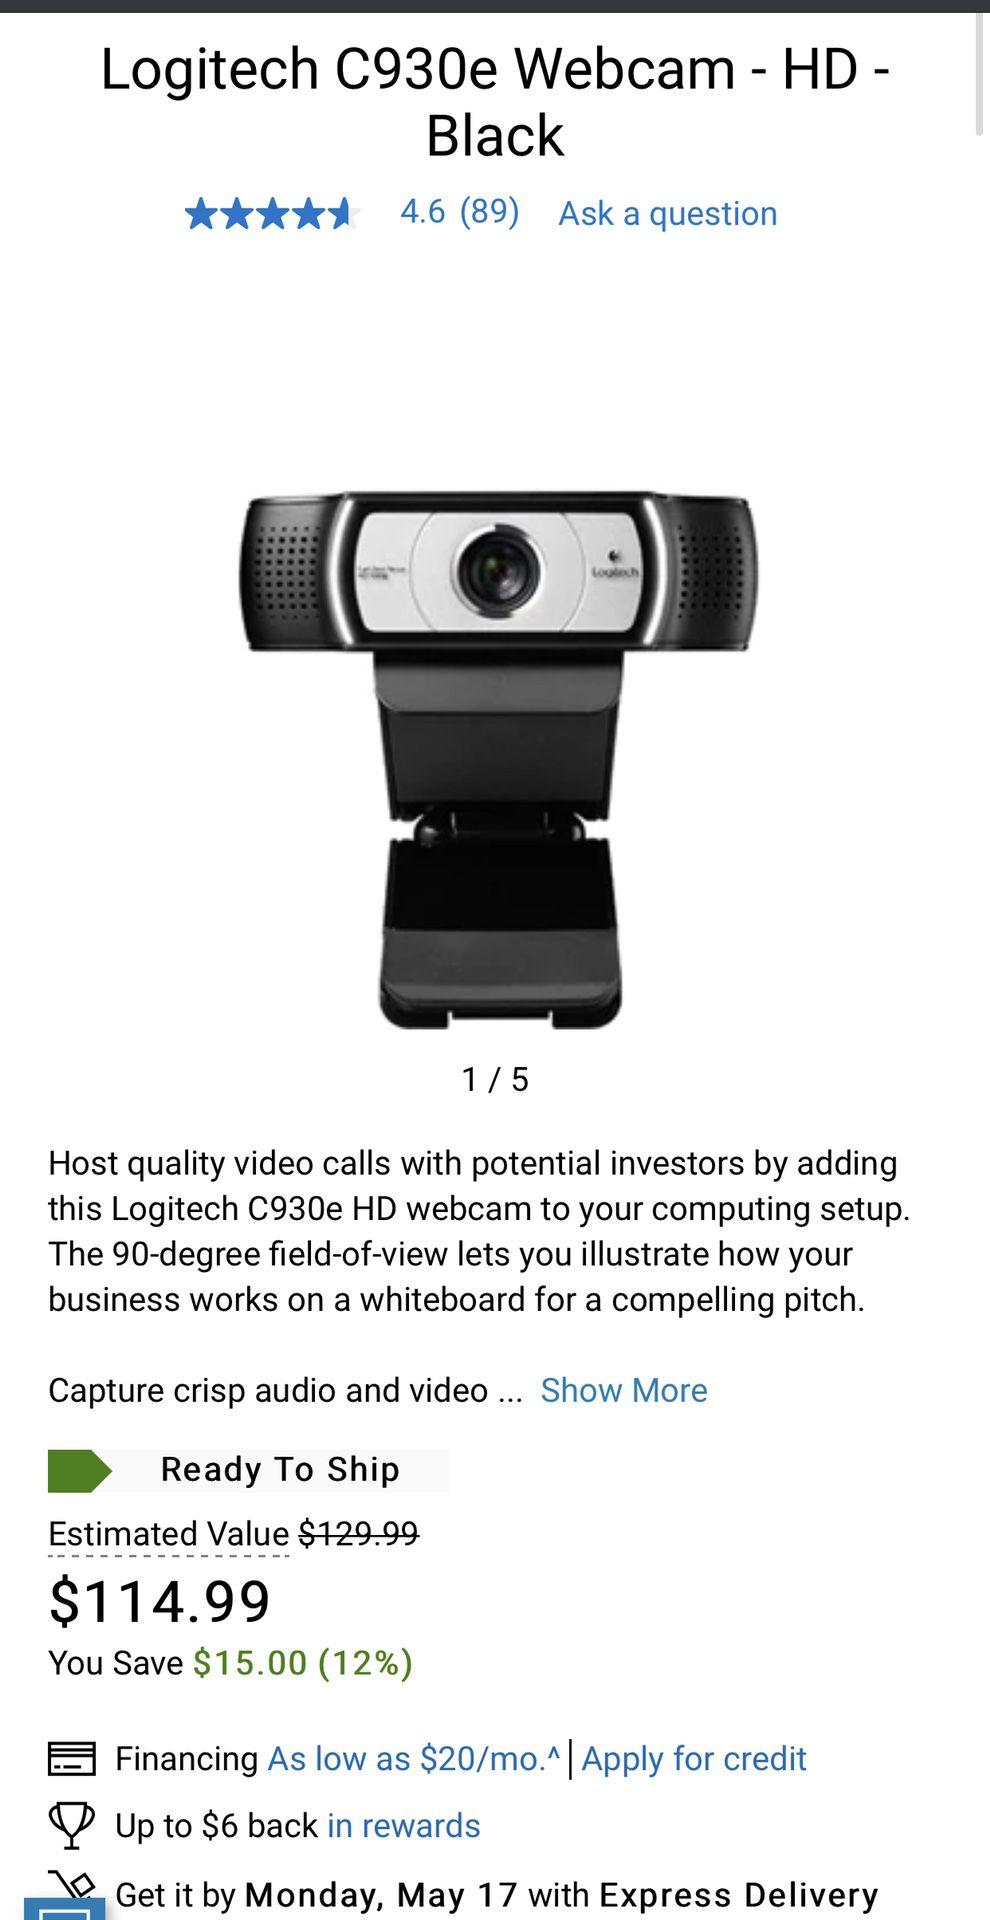 Logitech C930e Webcam - HD - Black